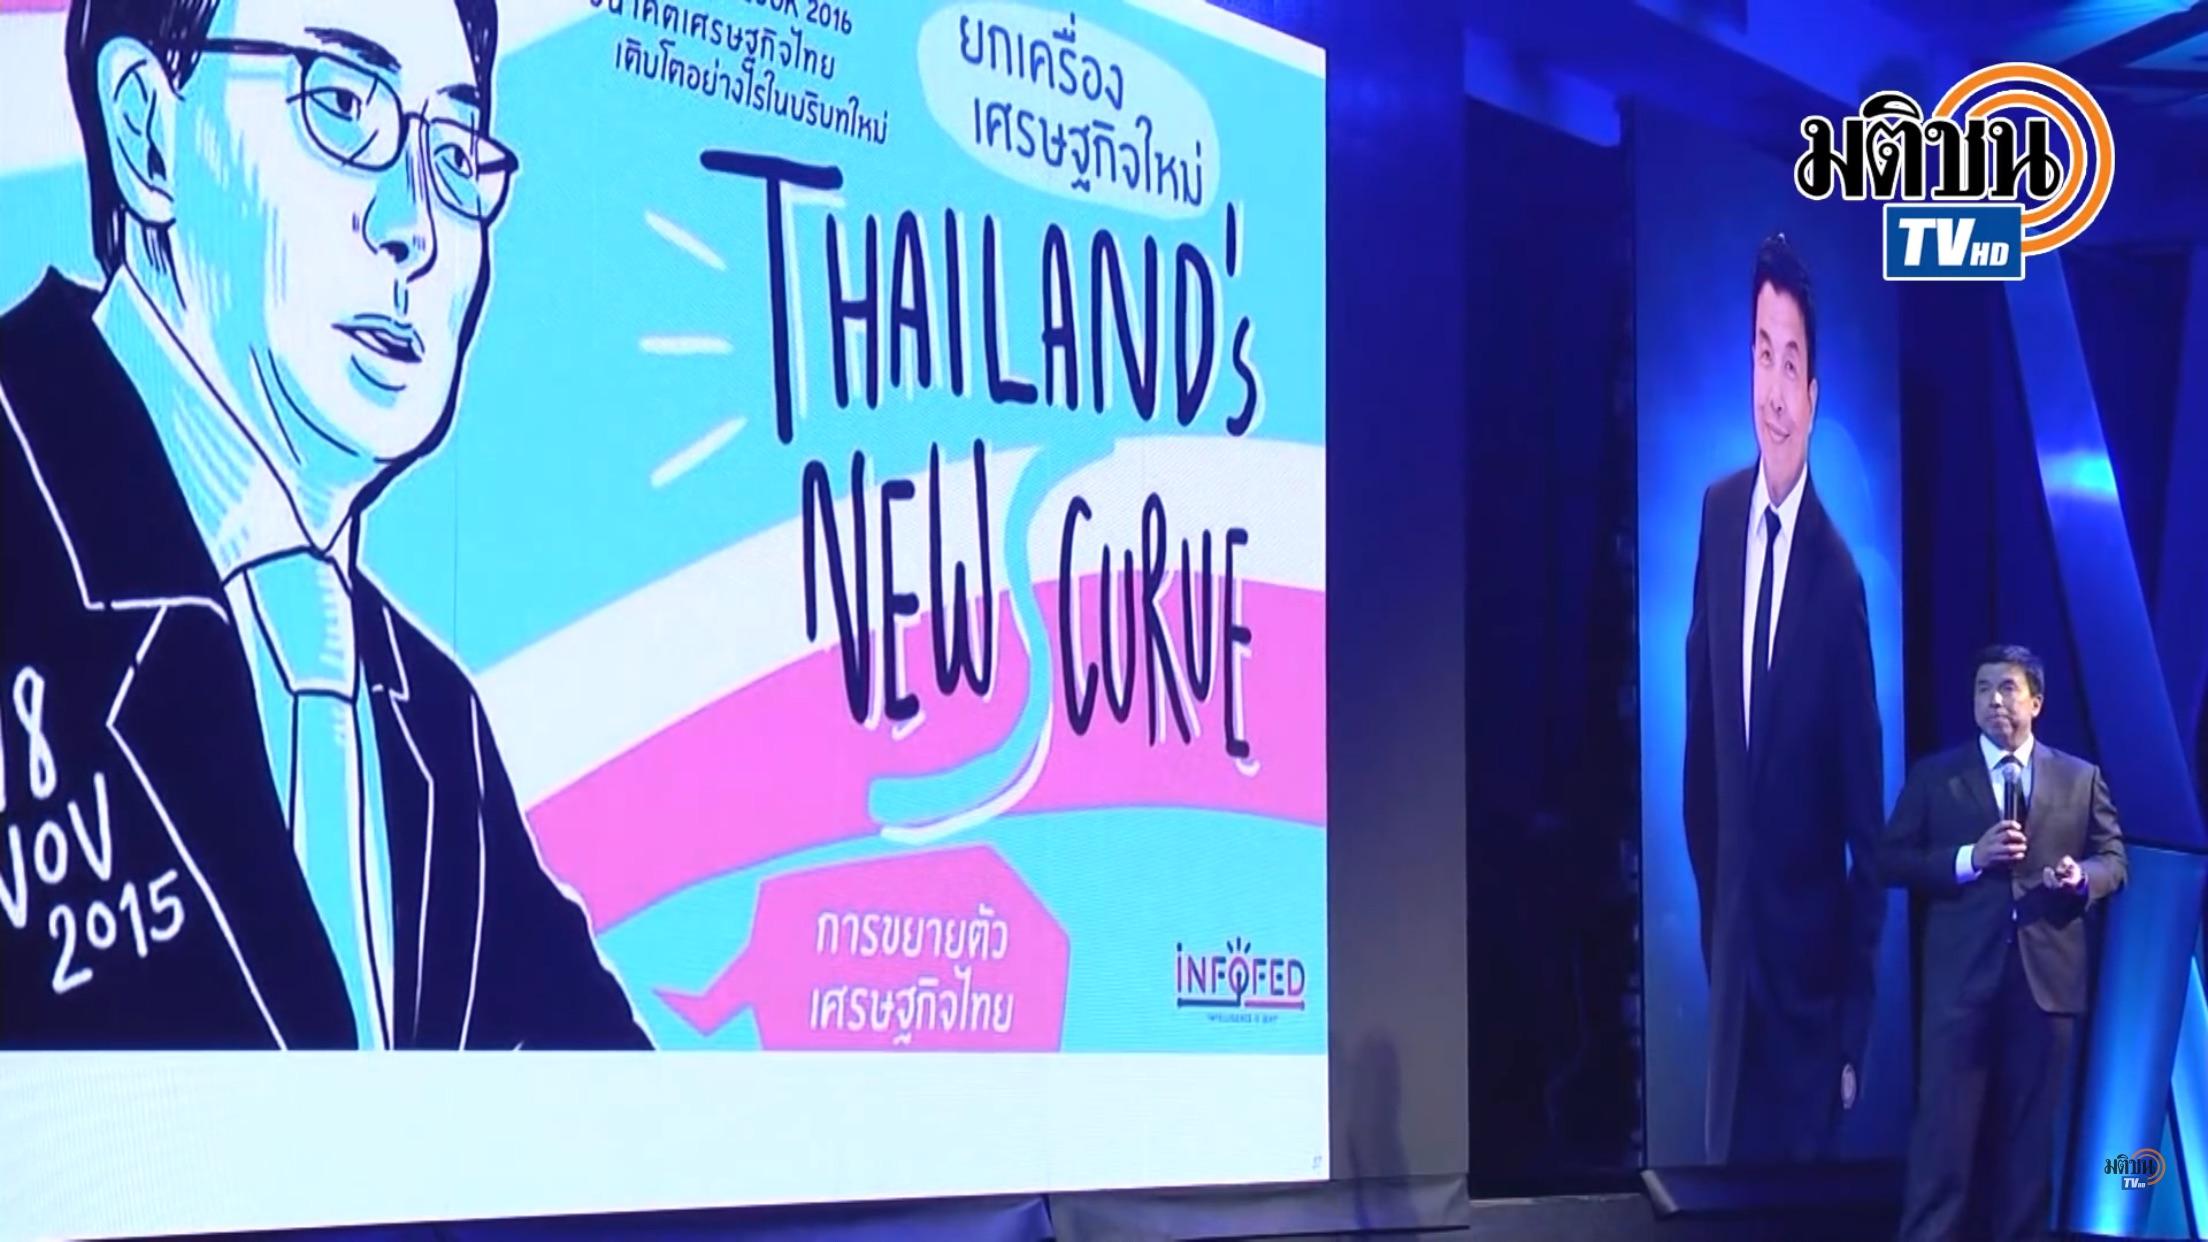 #DNAjournal EP.22 #DNAbySPU [ประเทศไทย…เปลี่ยนทันโลก] ดร.ชัชชาติ สิทธิพันธุ์ อดีต รมว.คมนาคม